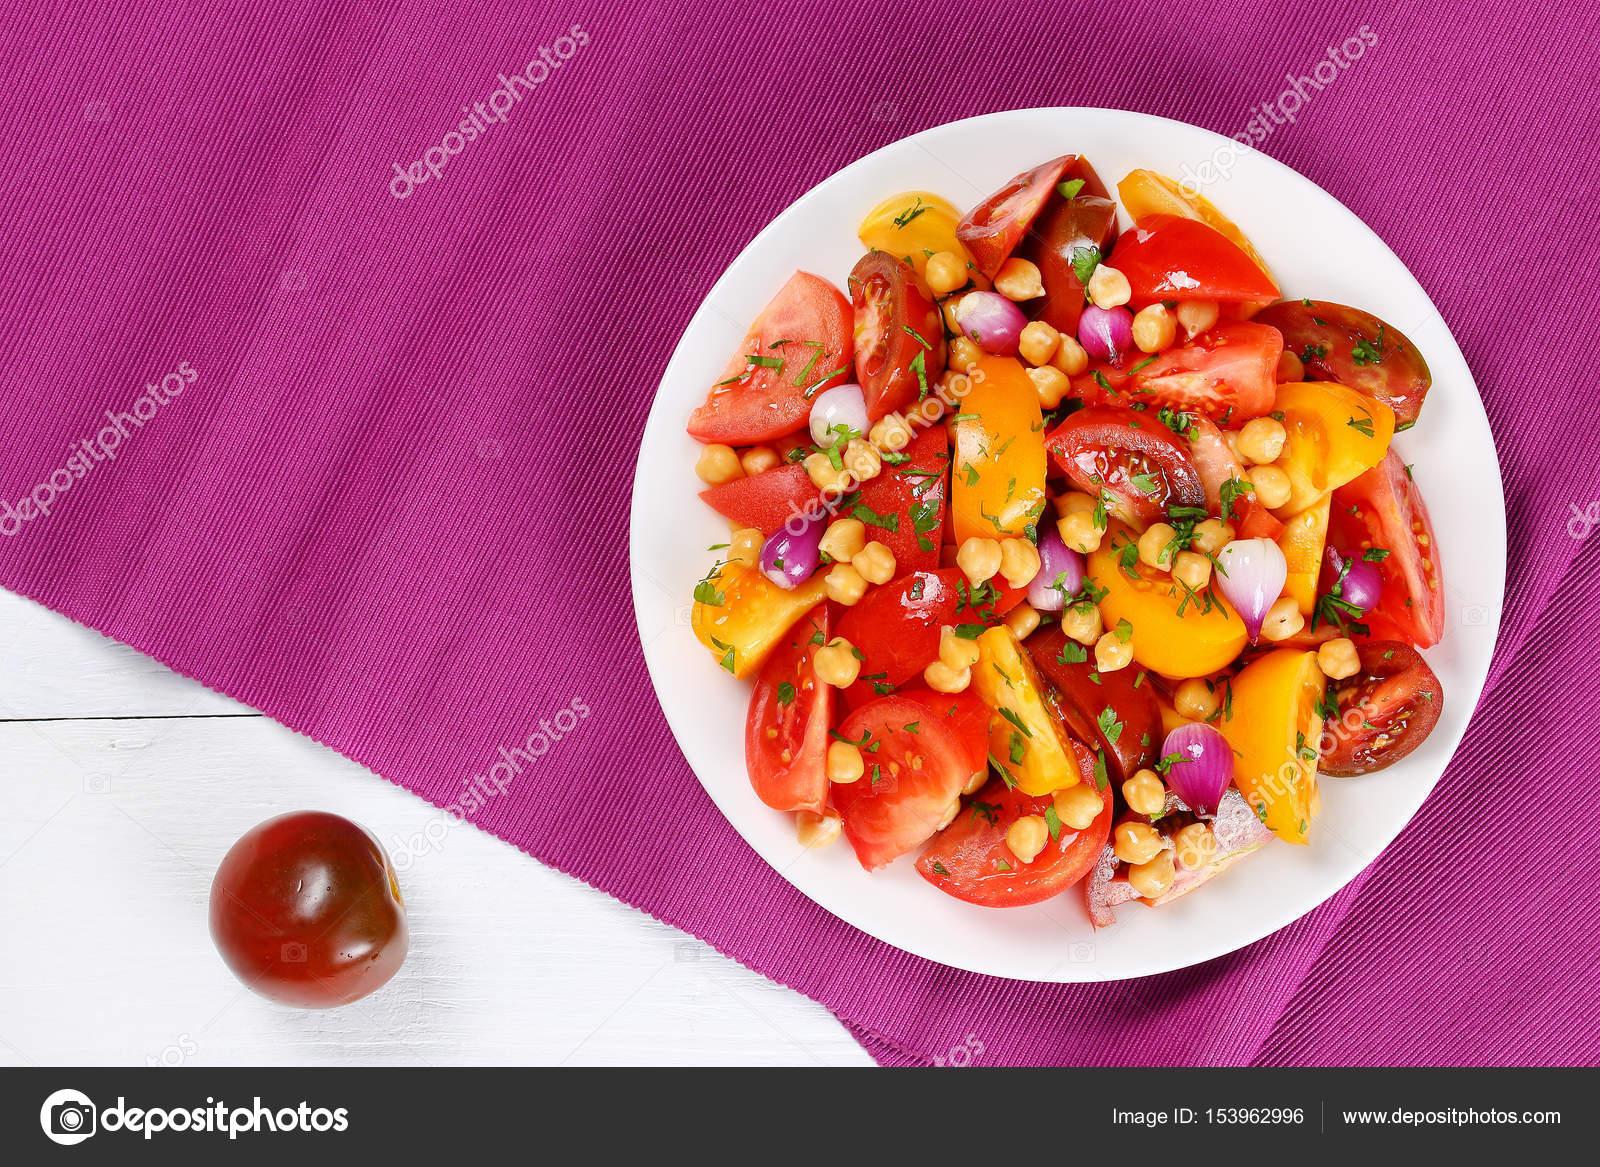 gesunde wenig kalorien salat mit kichererbsen stockfoto myviewpoint 153962996. Black Bedroom Furniture Sets. Home Design Ideas